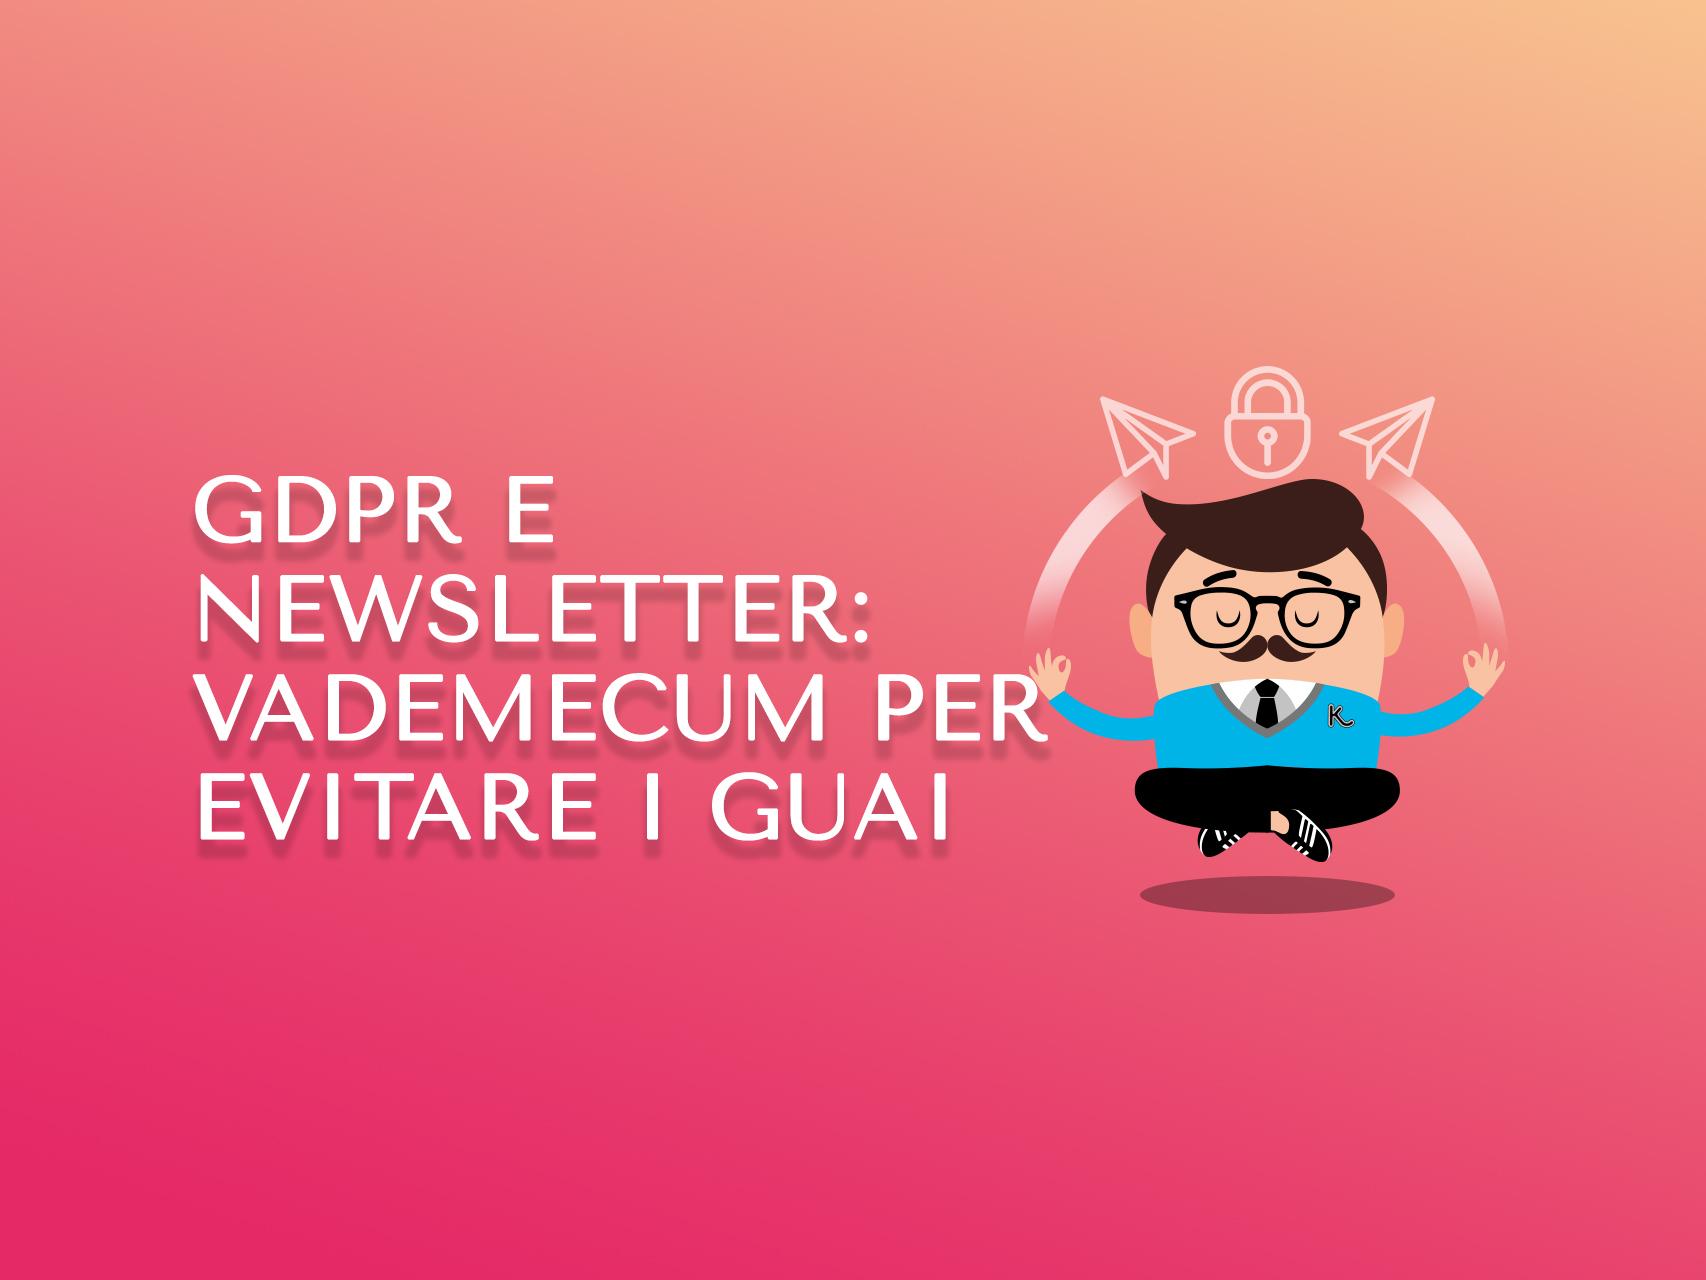 GDPR e newsletter: vademecum per evitare i guai